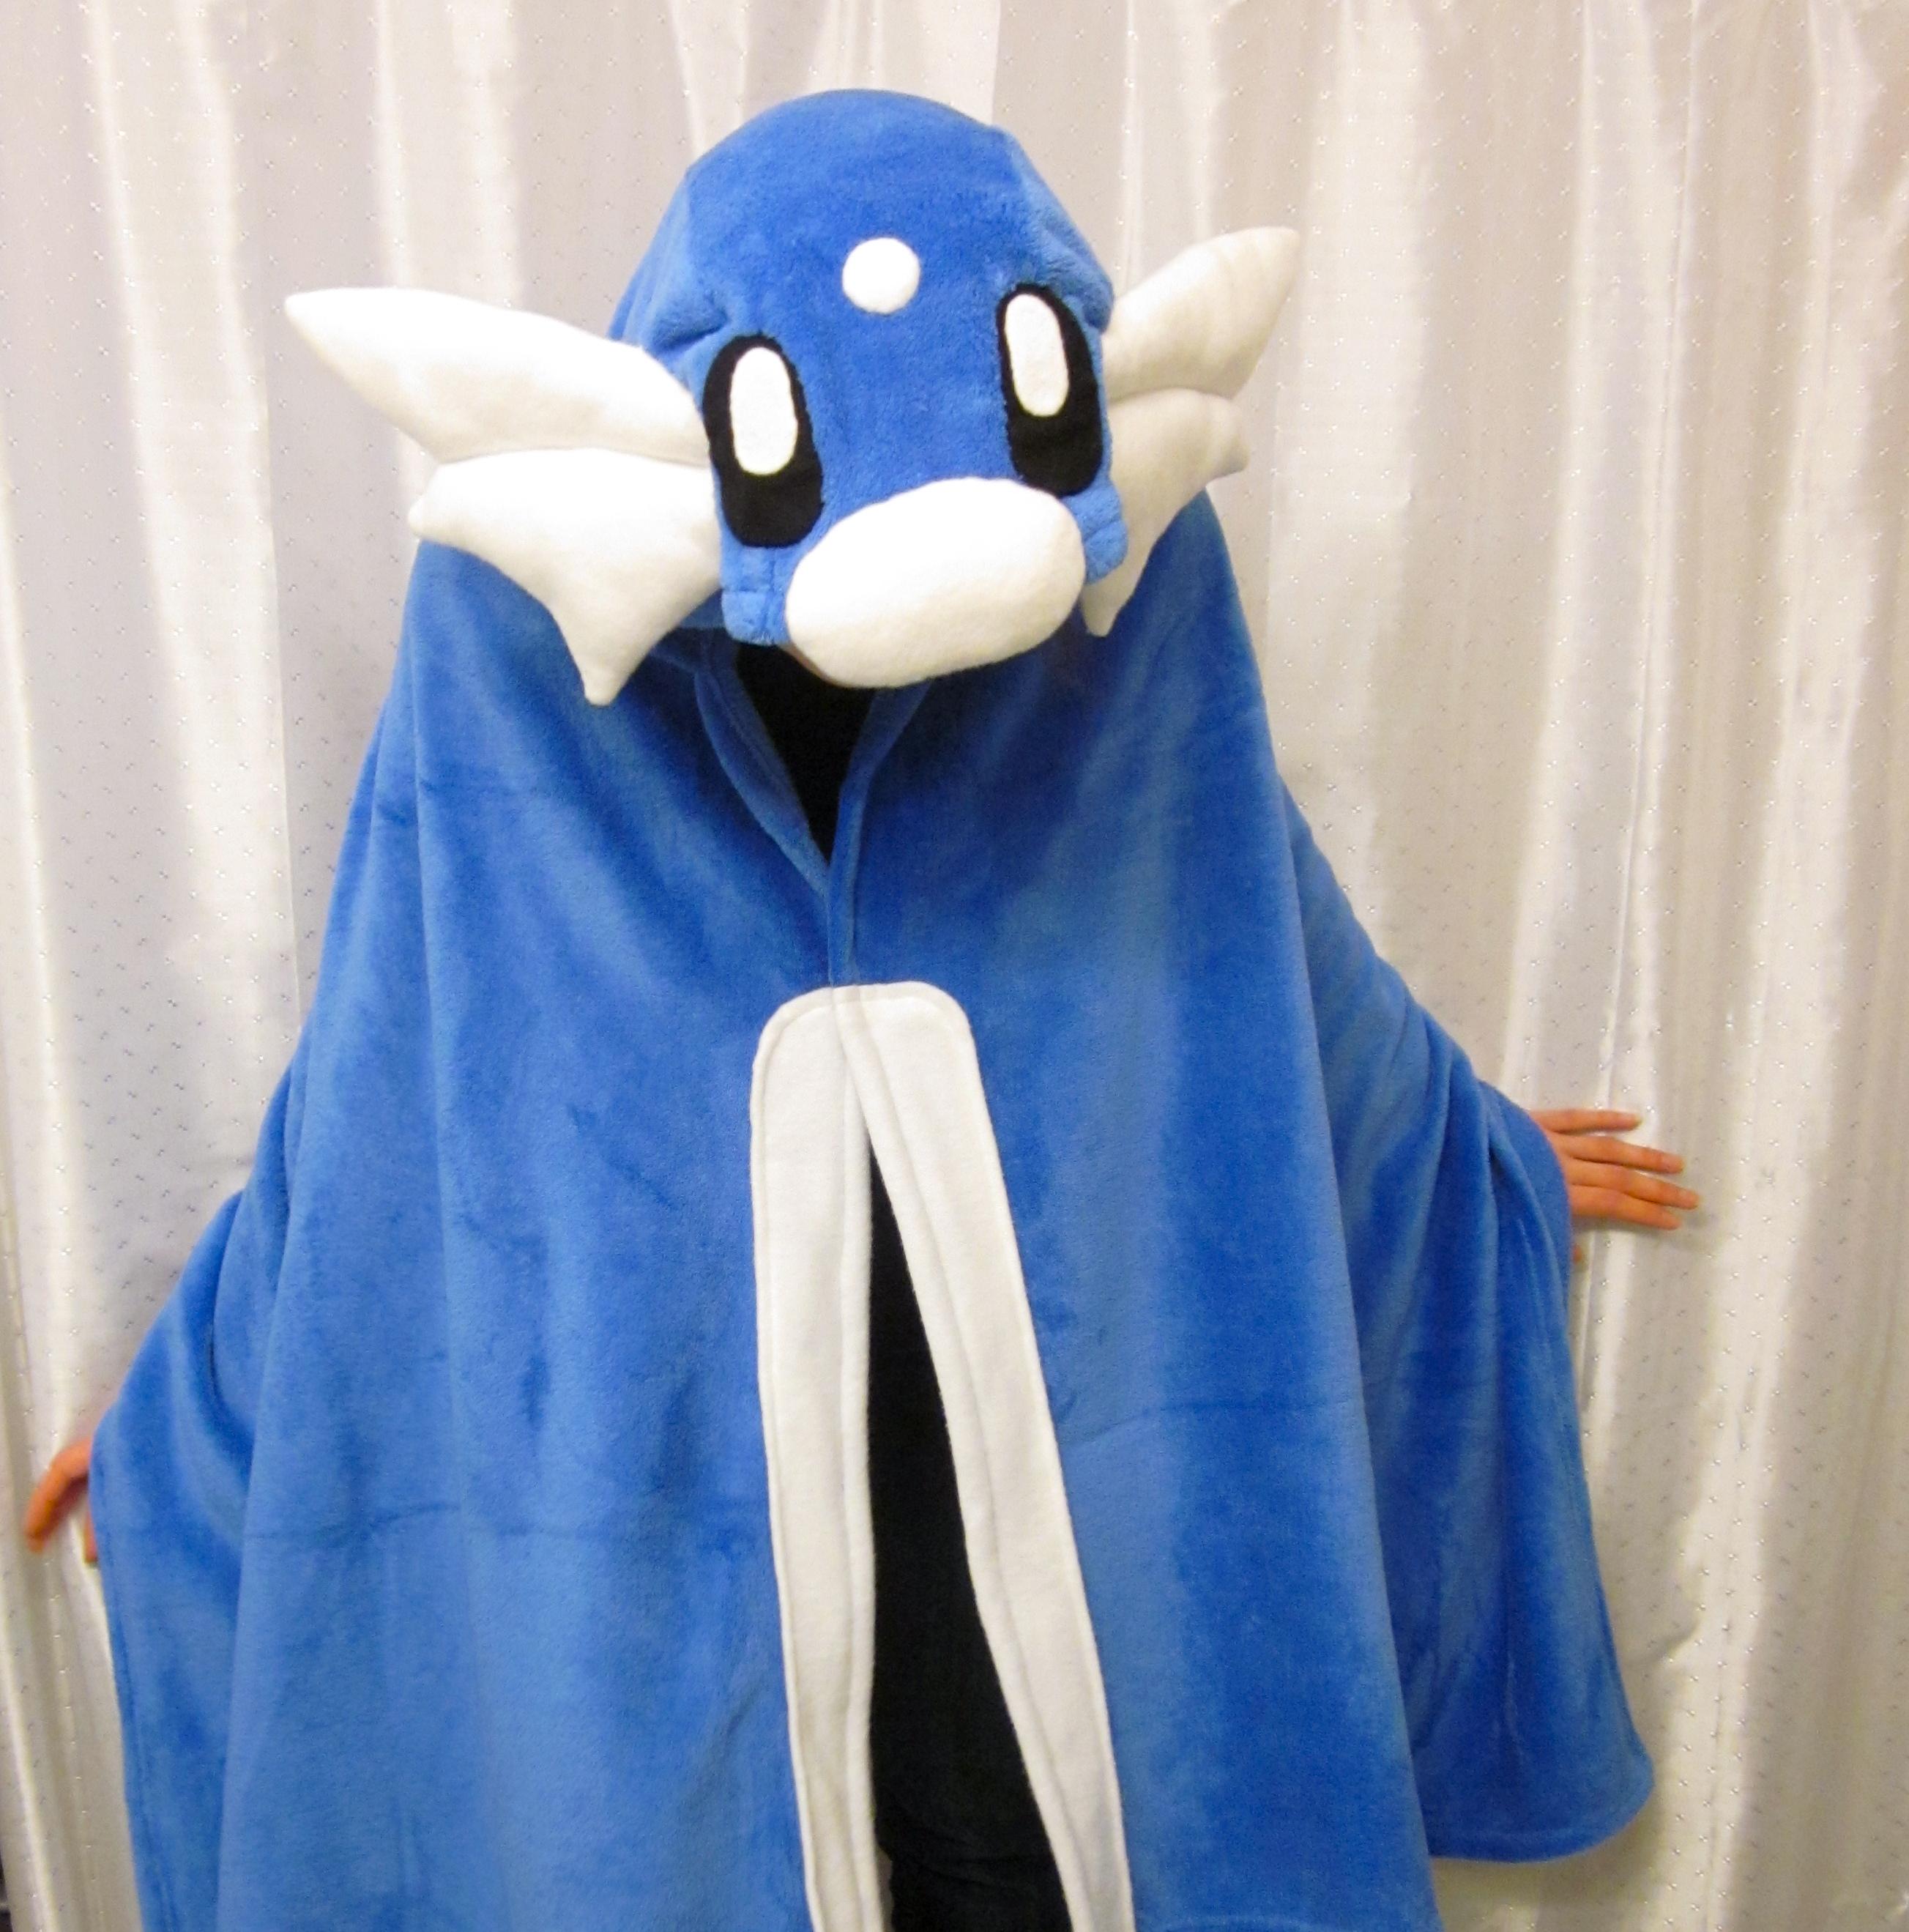 Hooded Character Blanket